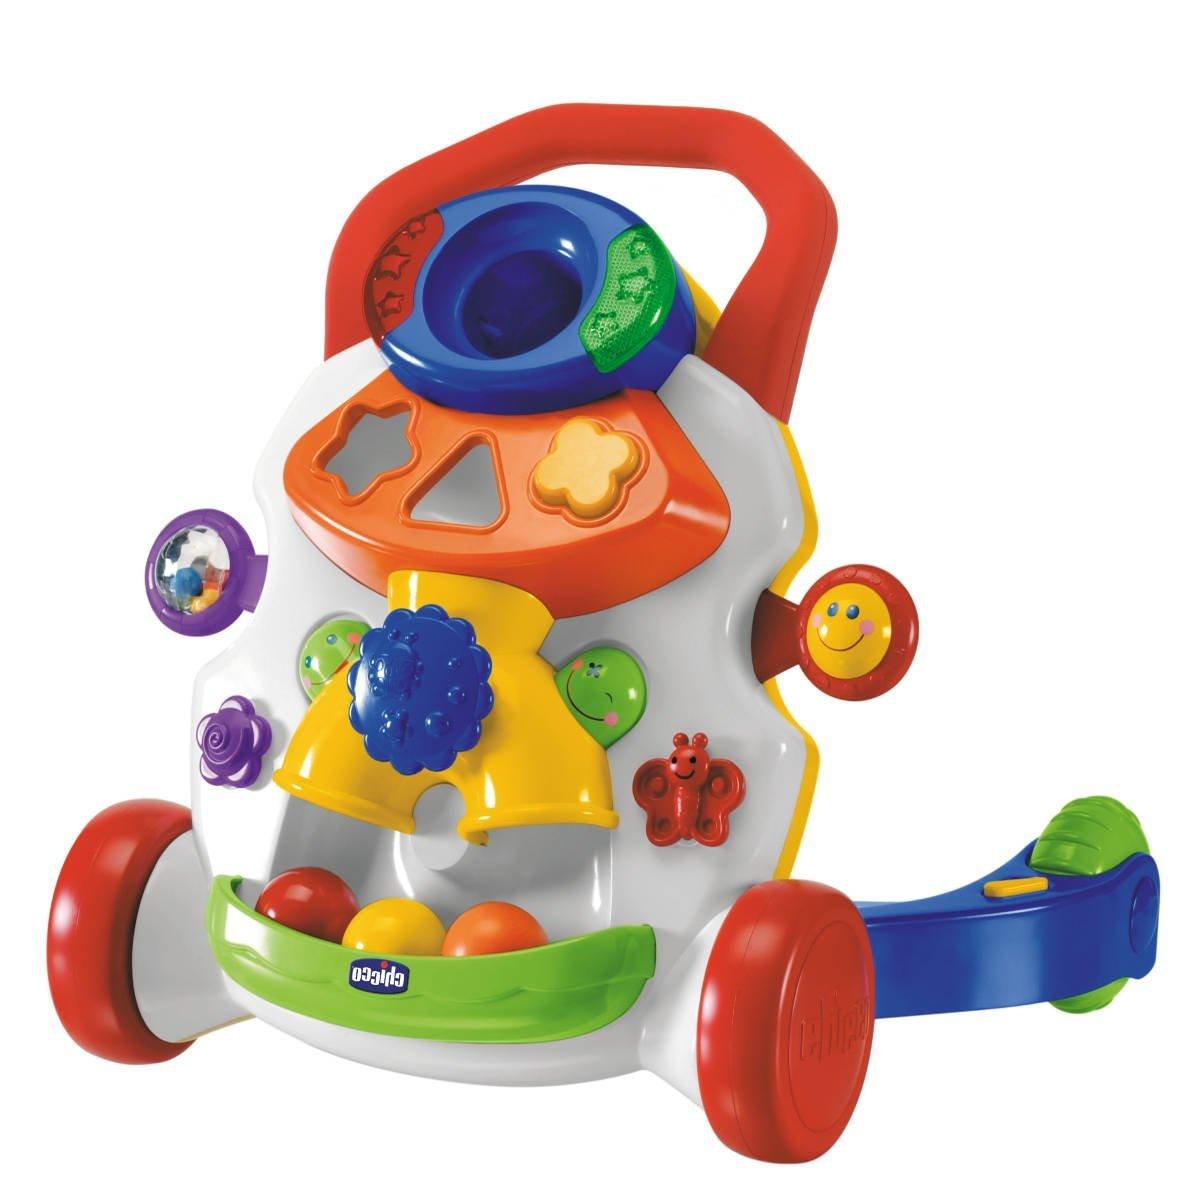 IDEAS DE REGALO para bebés a partir de 6 meses hasta 12 meses - Correpasillos andador de Chicco para regalar www.madreyblogger.com